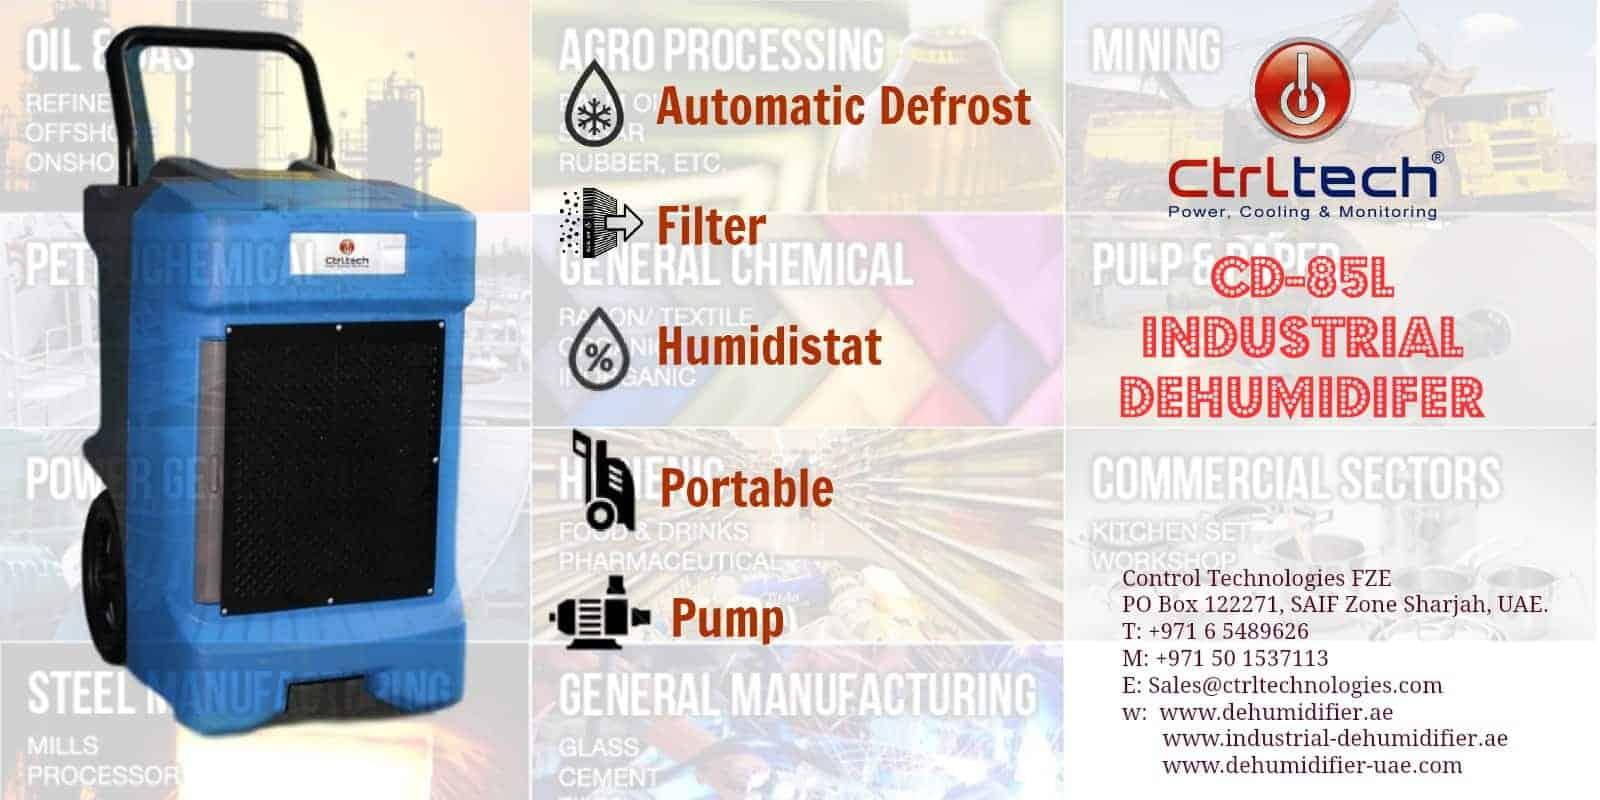 Industrial Dehumidifier Reviews: CD-85L Large Dehumidifier.